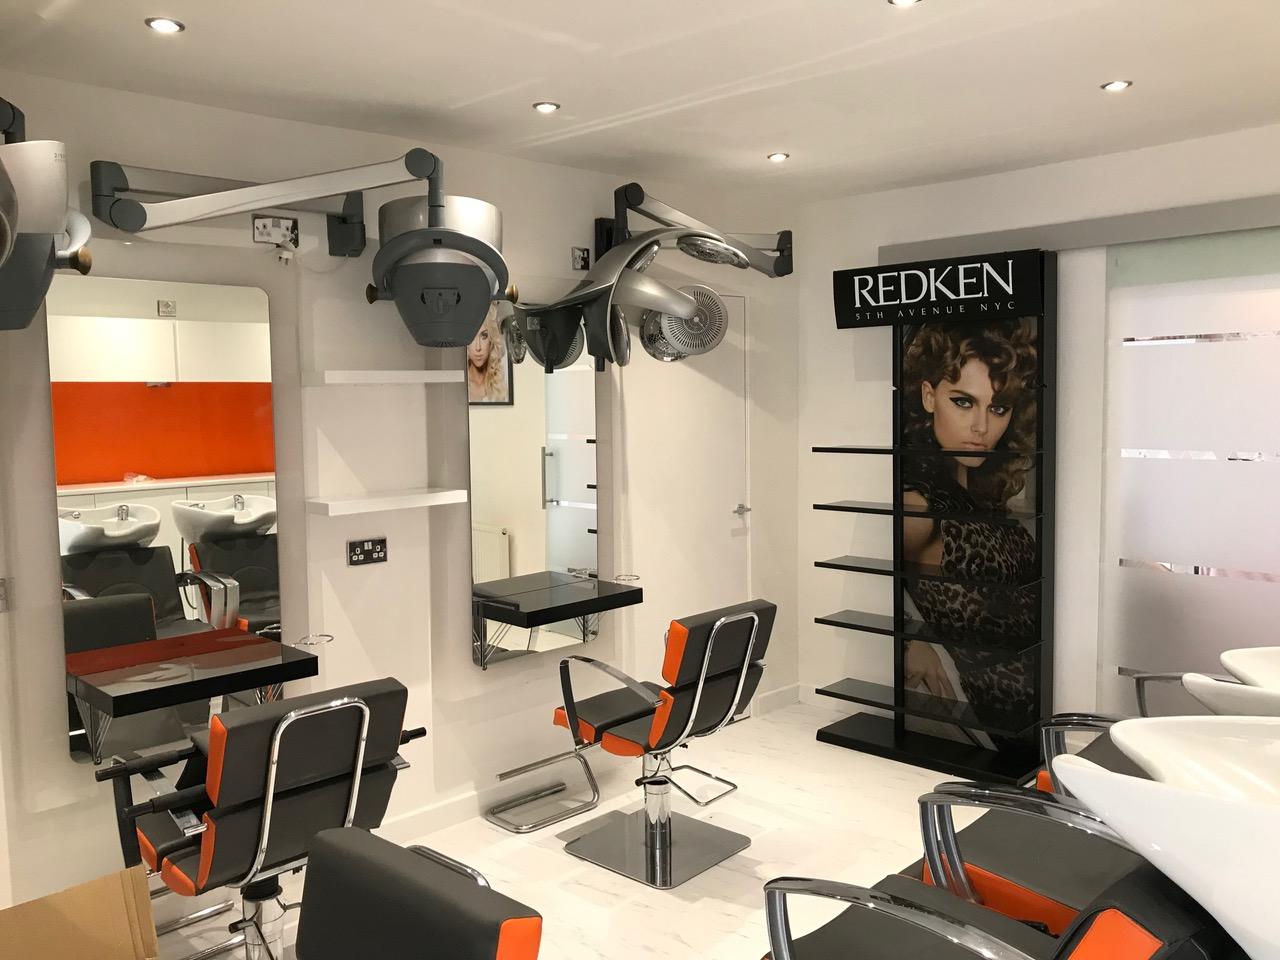 The Salon Sherburn Contact Us page image no 3